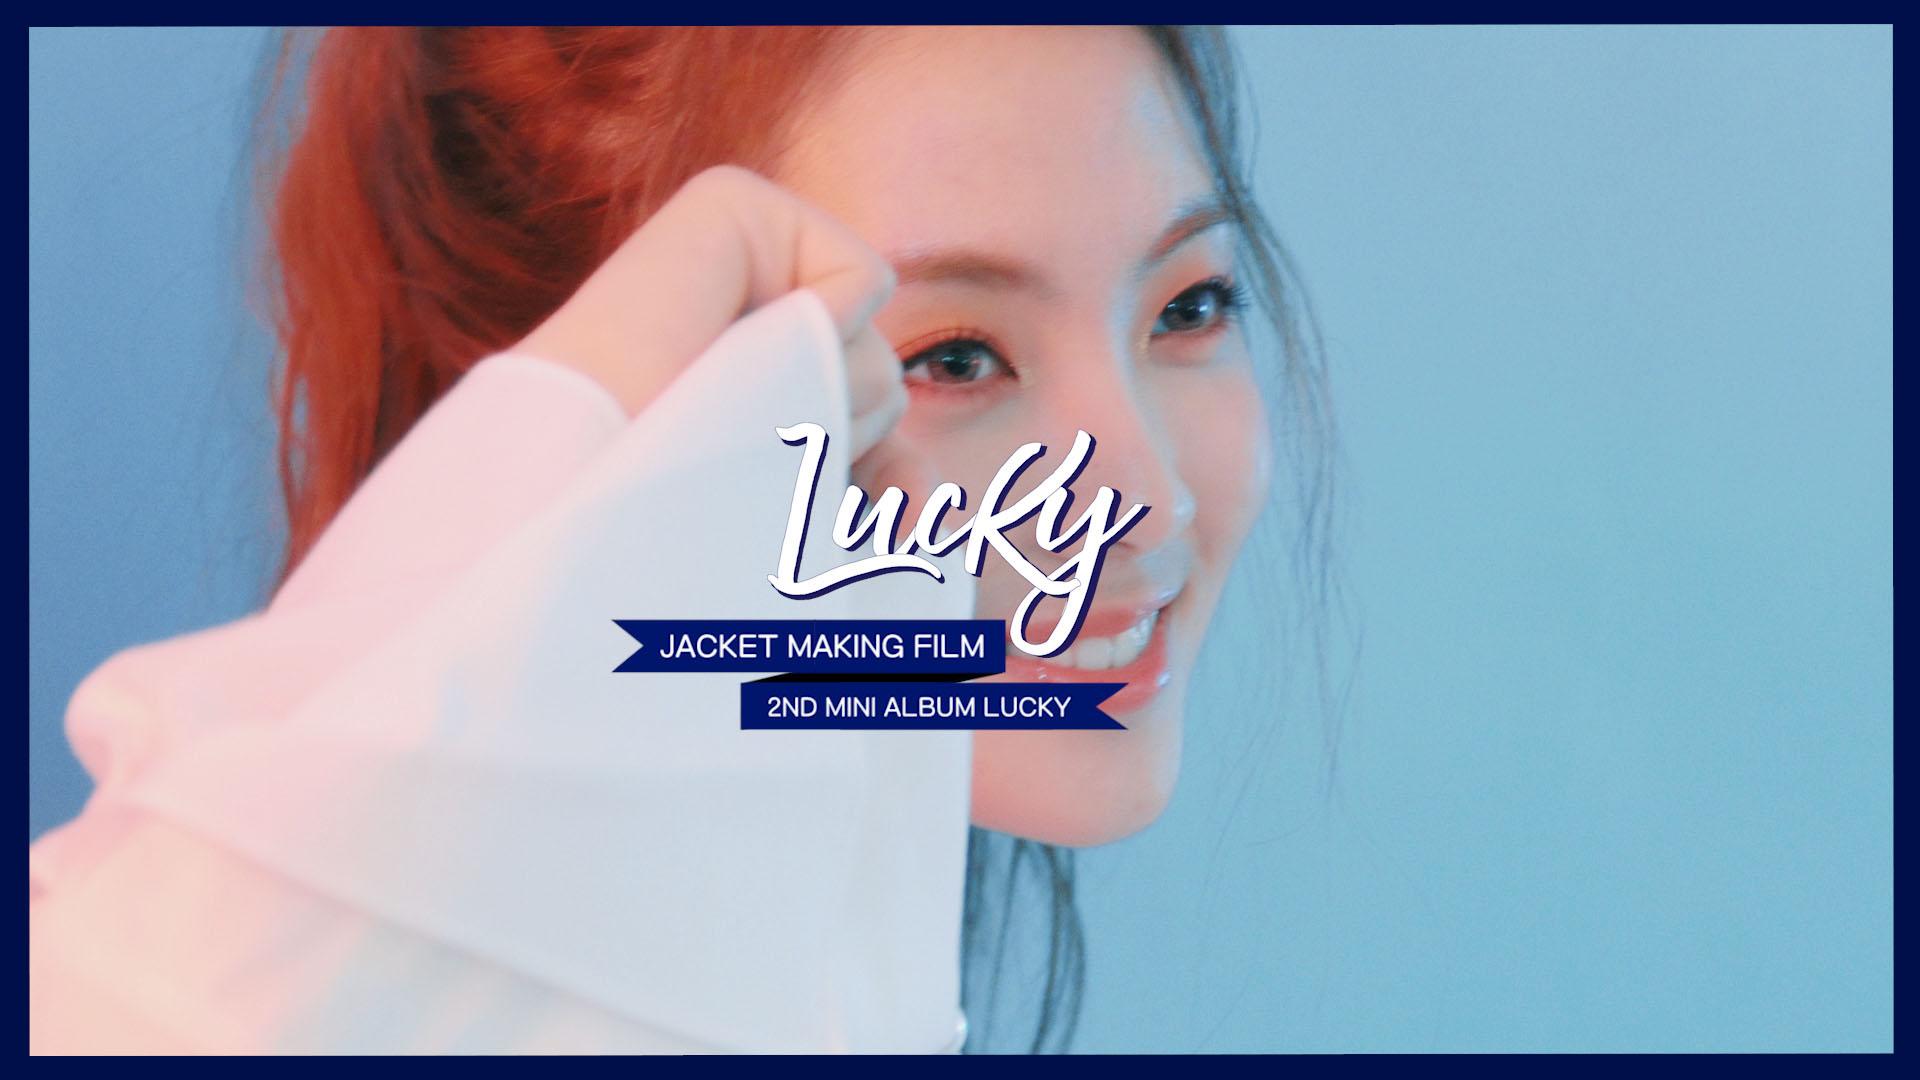 Weki Meki 위키미키 - 2nd Mini Album 'LUCKY' JACKET MAKING FILM